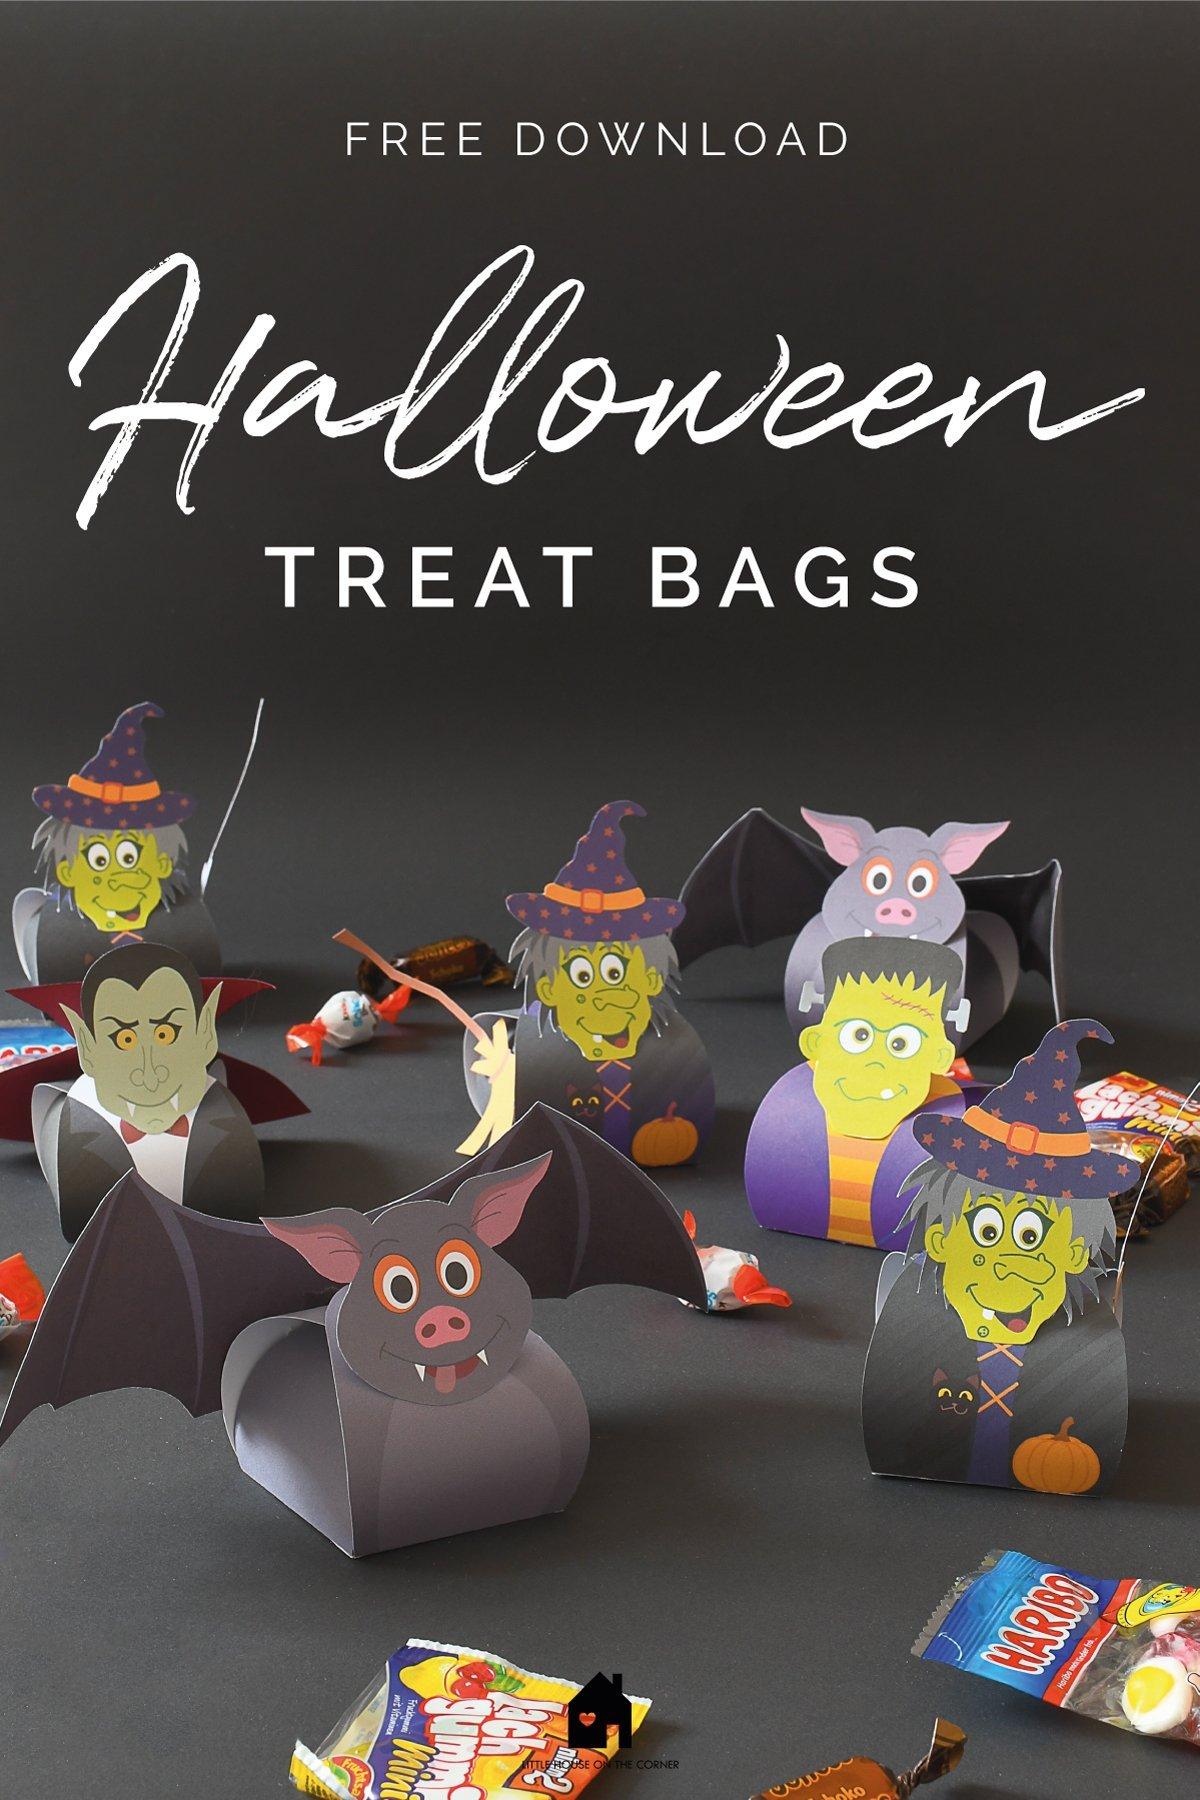 Halloween Treat Boxes - Free Printable - Frankenstein Treat Box - Witch Treat Box - Bat Treat Box - Dracula Treat Box | Little House On The Corner